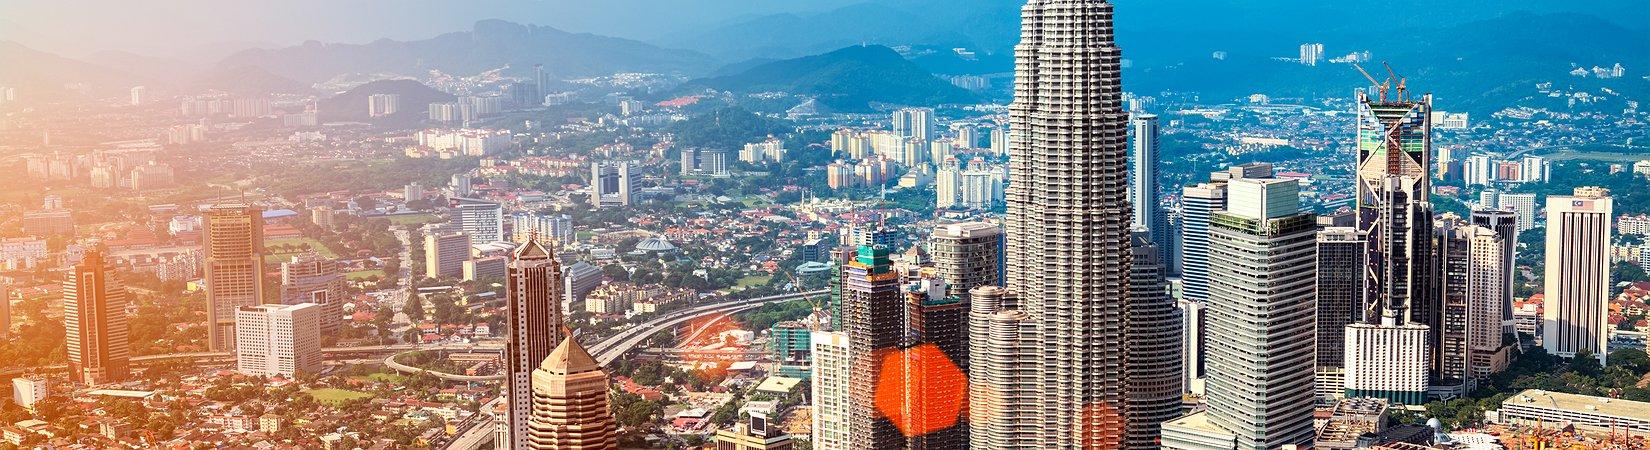 Ásia vai continuar a liderar o crescimento global